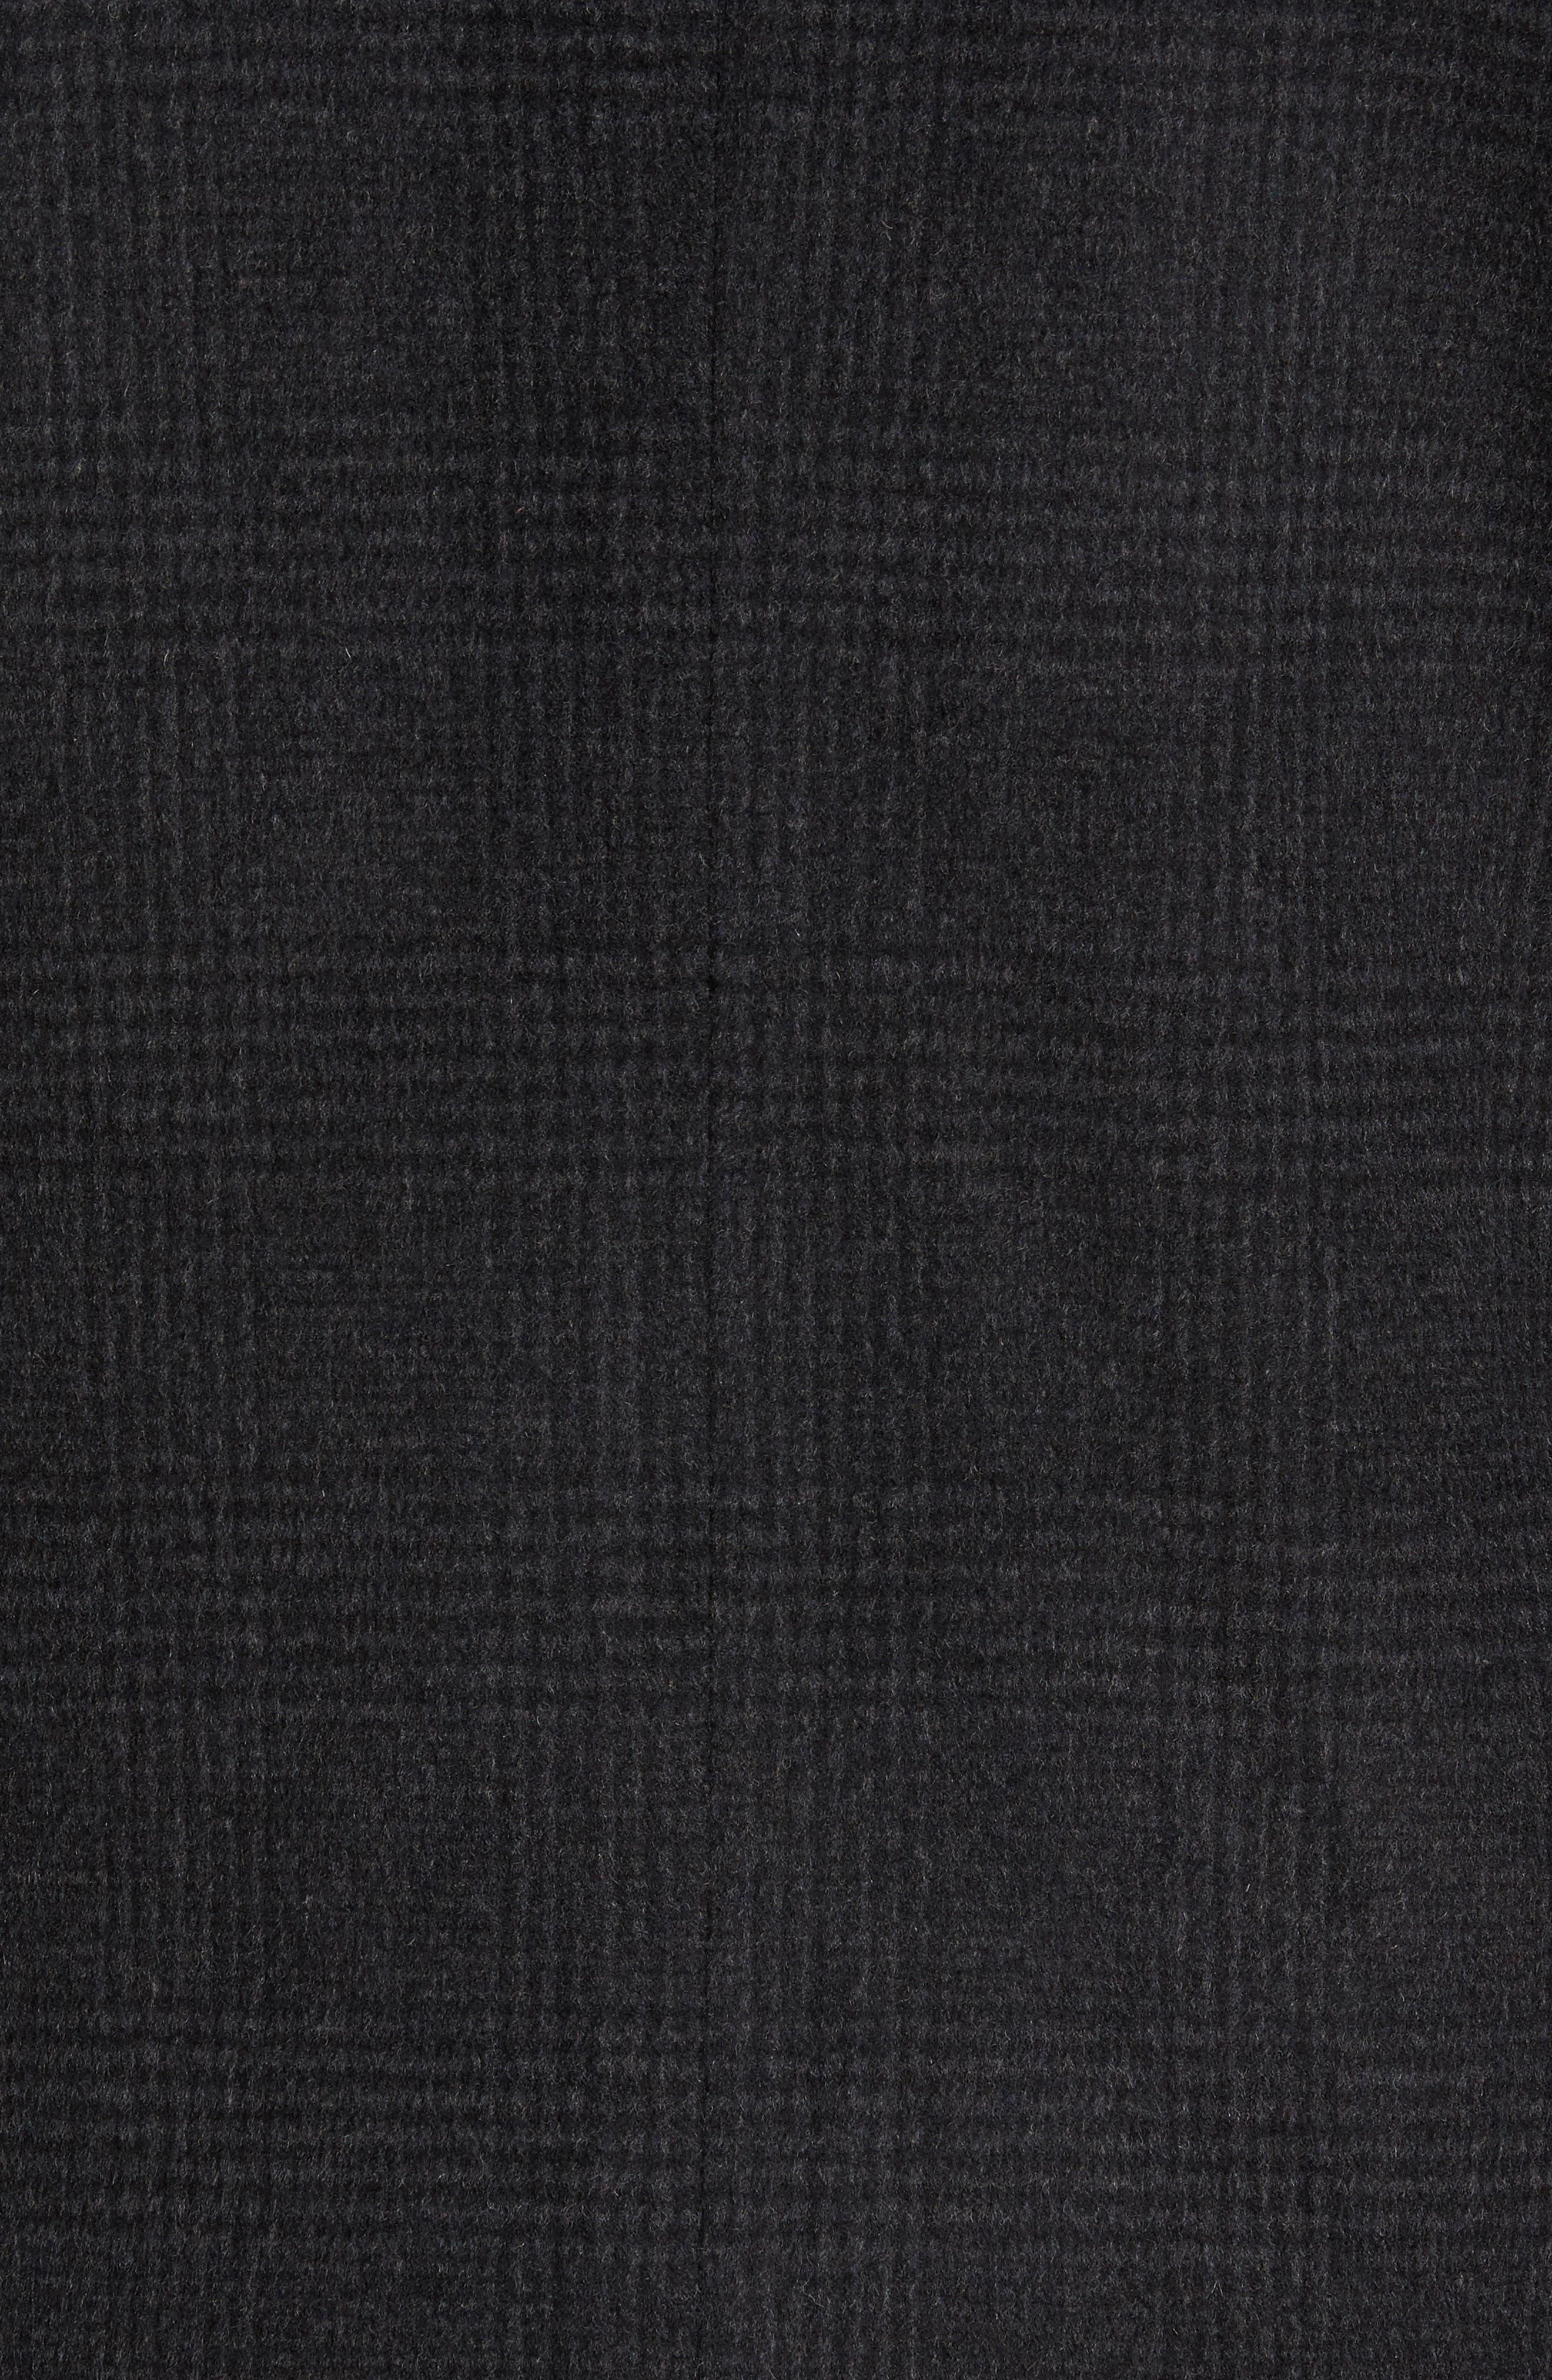 Turner Plaid Wool Blend Topcoat,                             Alternate thumbnail 5, color,                             Dark Charcoal